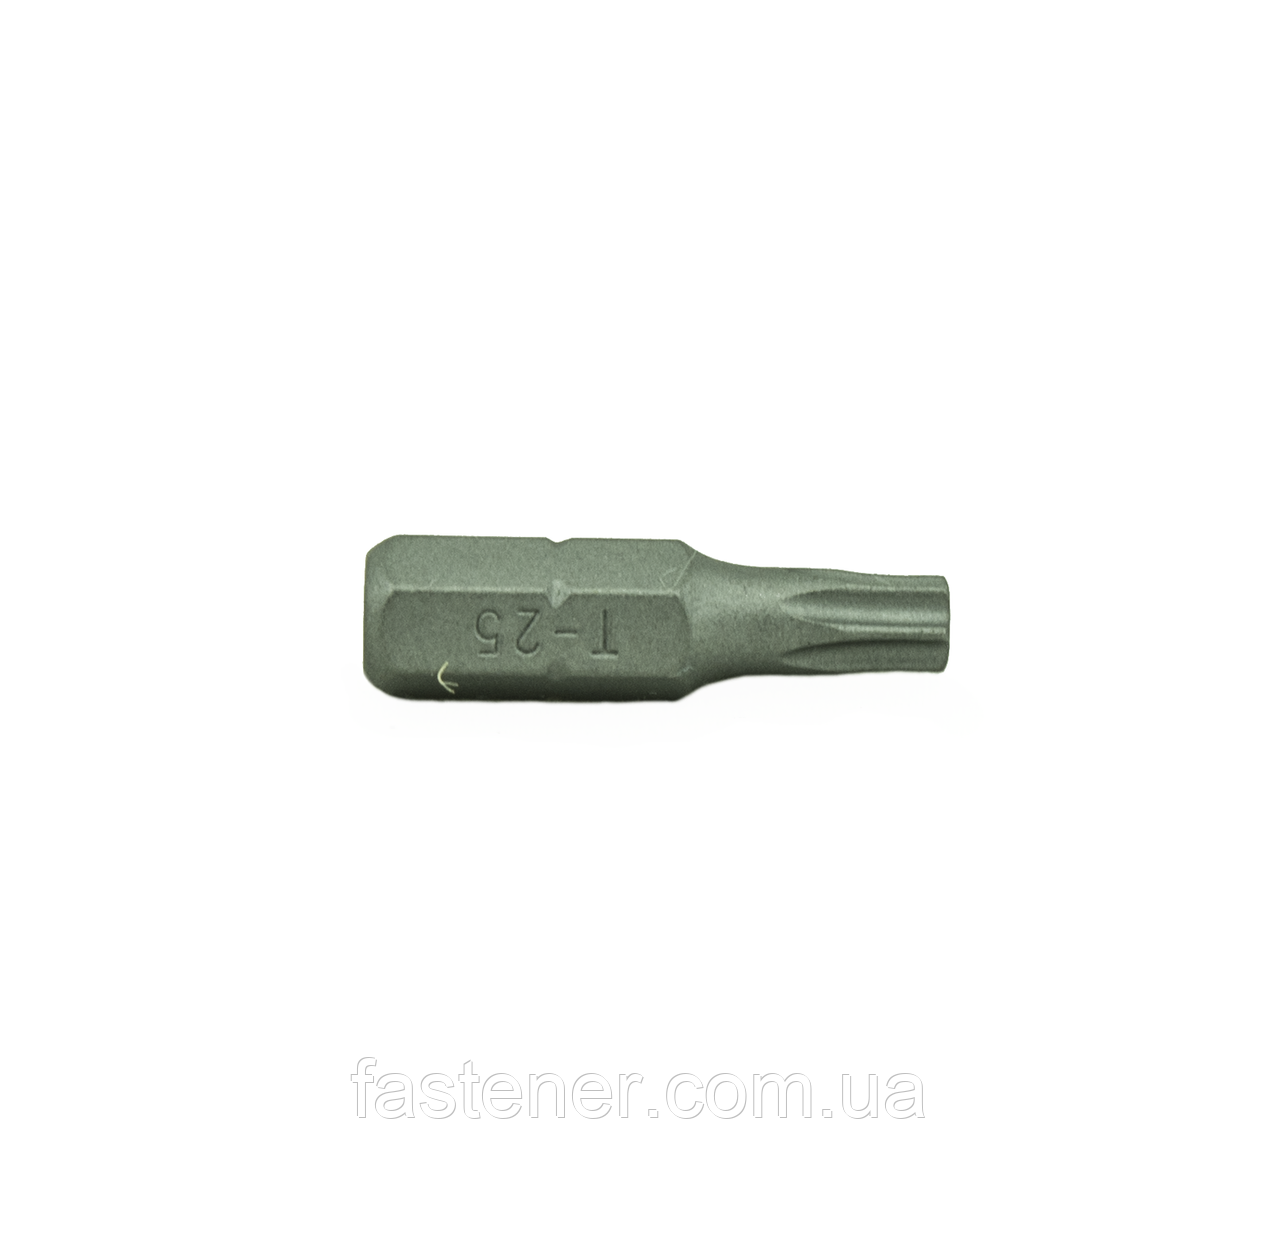 Бита TX25x25 mm STICK FIT (упак. 10 шт), Швеция